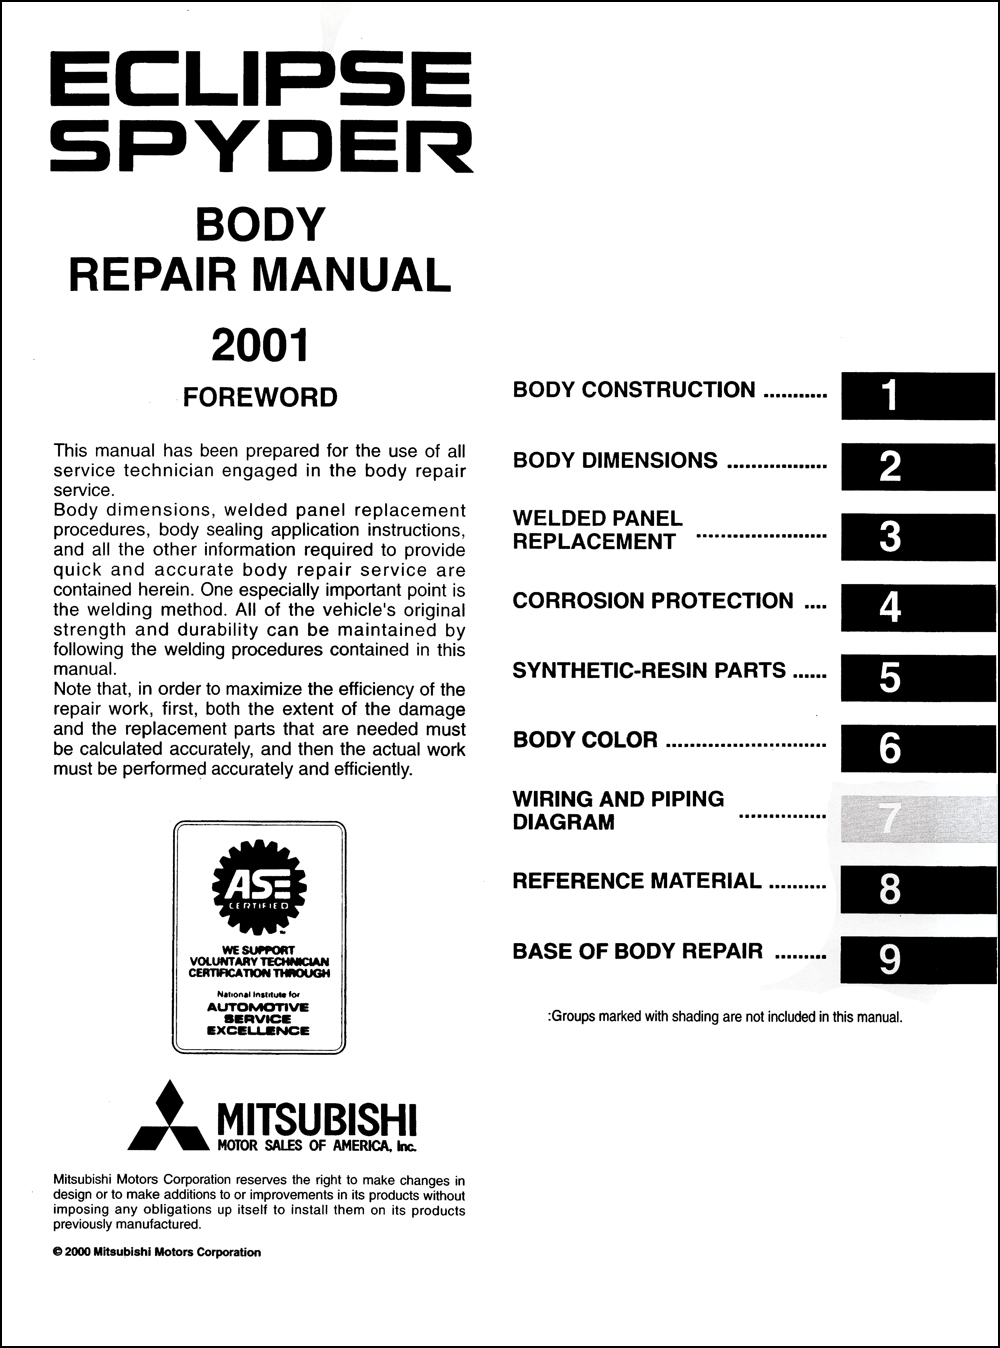 2001-2005 Mitsubishi Eclipse Spyder Body Repair Shop